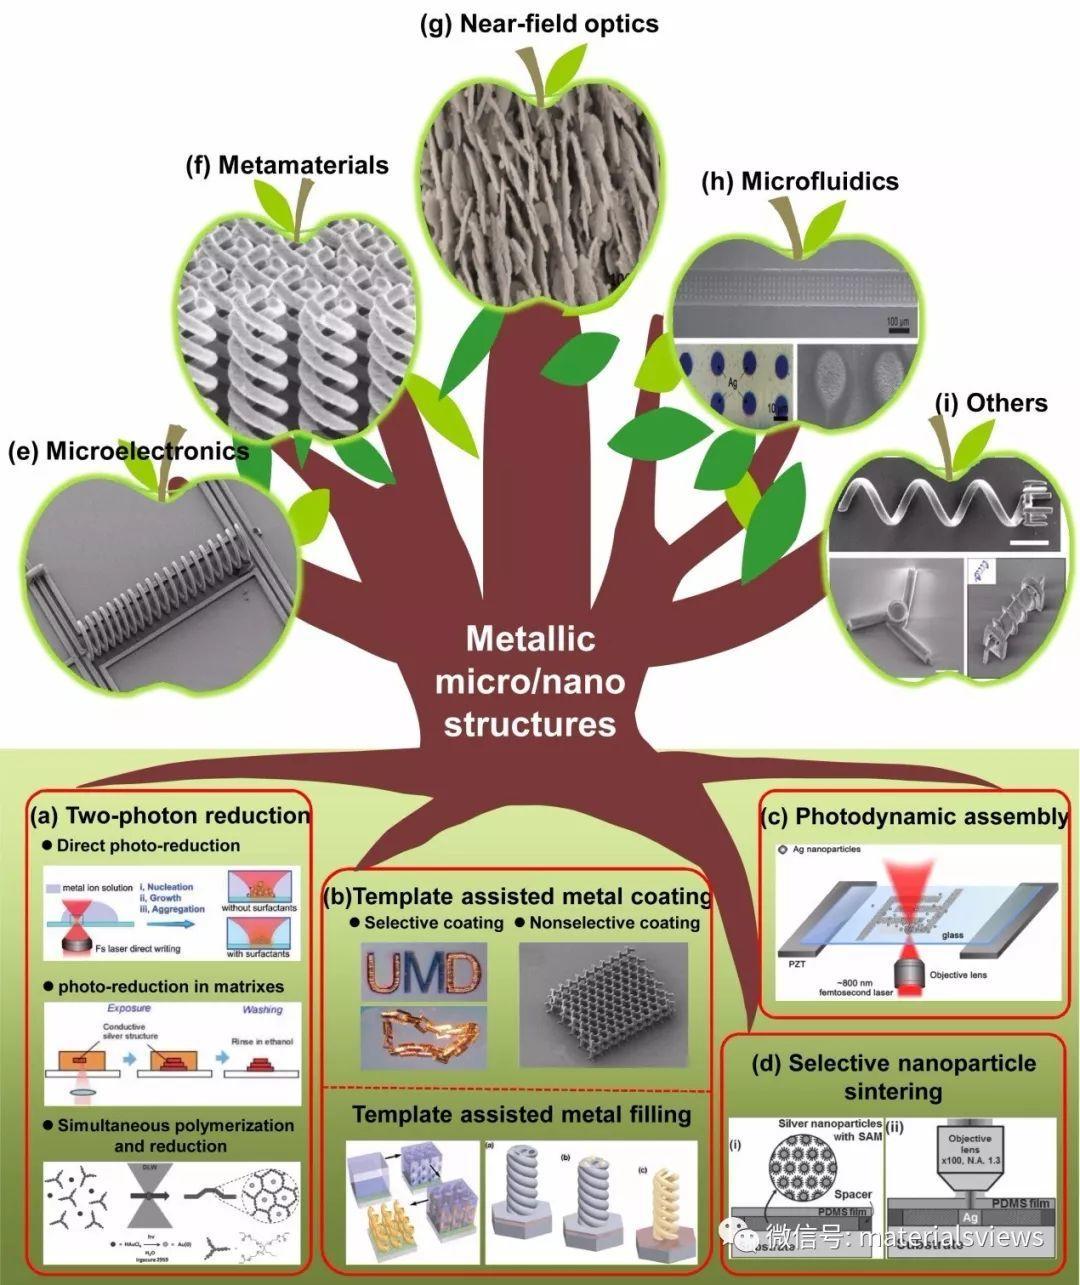 Small Methods: 飞秒激光直写金属微纳结构 - 从制造方法到未来应用